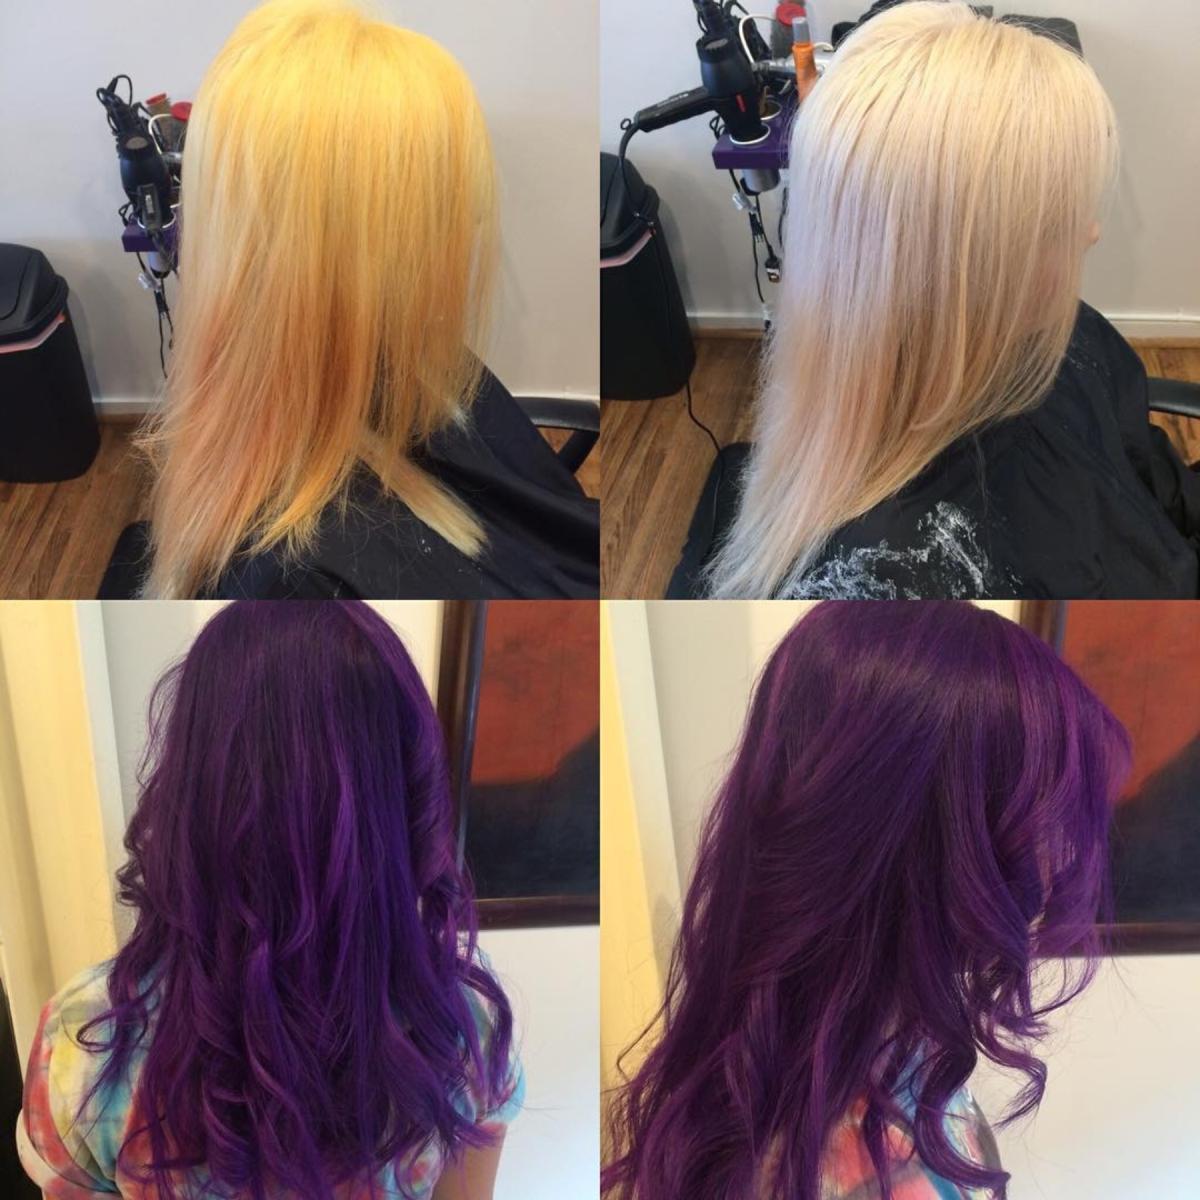 Hillary Loves Hair Salon Asheville NC Color Big Process Big Reveal Hair Stylist Hillary Small